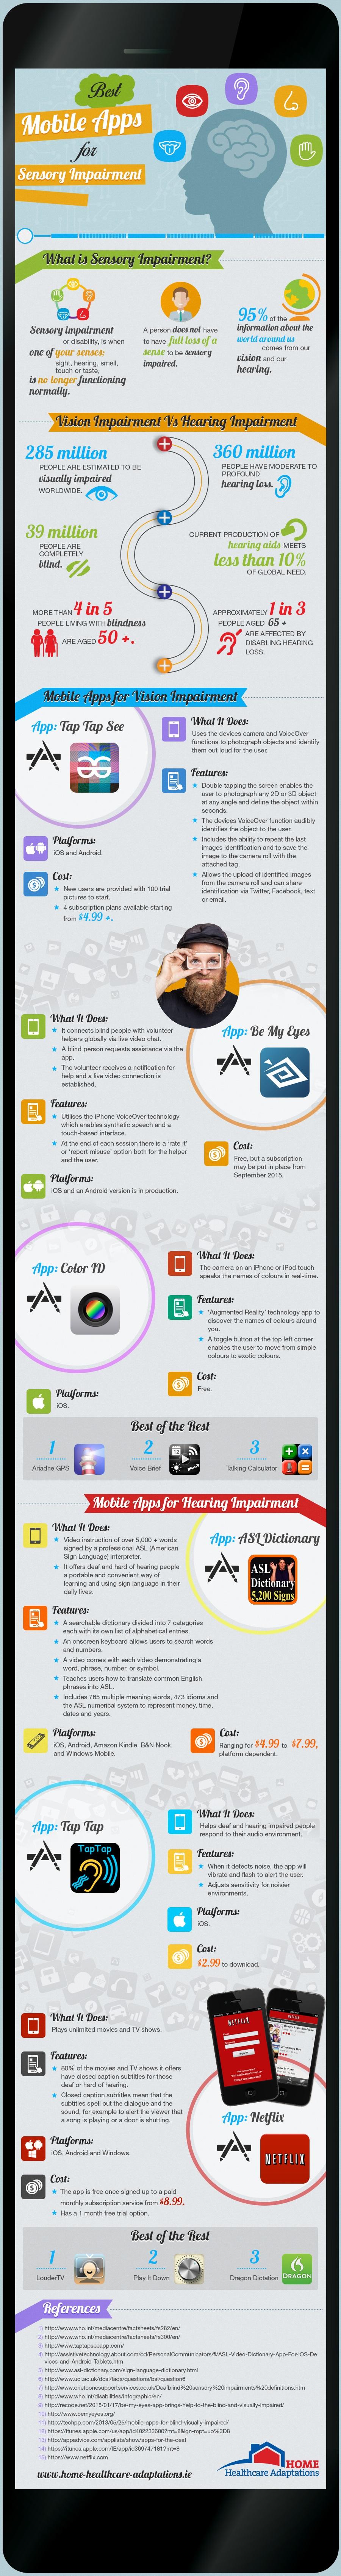 Best Mobile Apps for Sensory Impairments